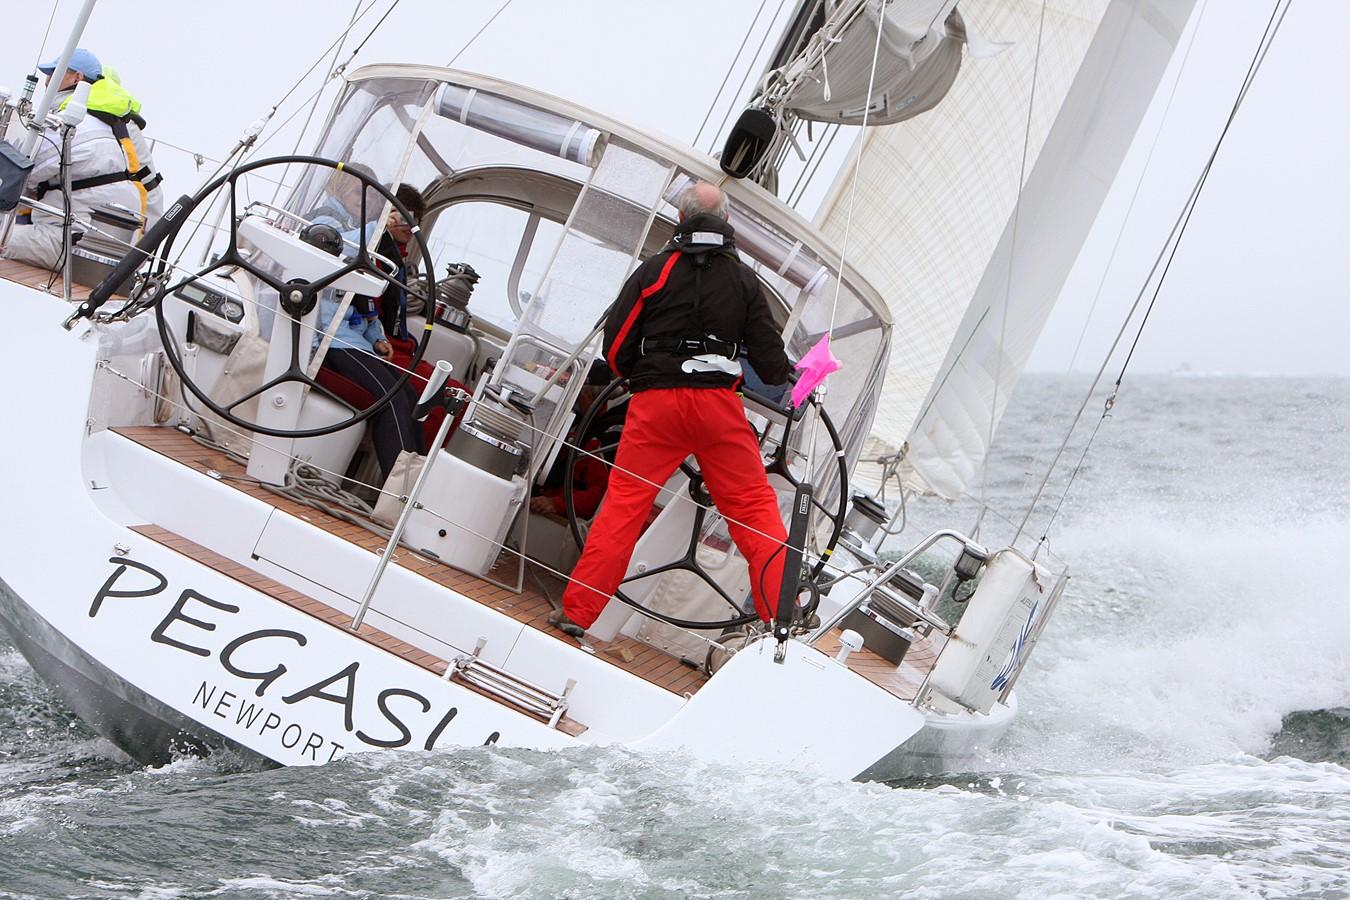 Bermuda Race 2004 INDIGO YACHTS  Cruising Sailboat 1873075